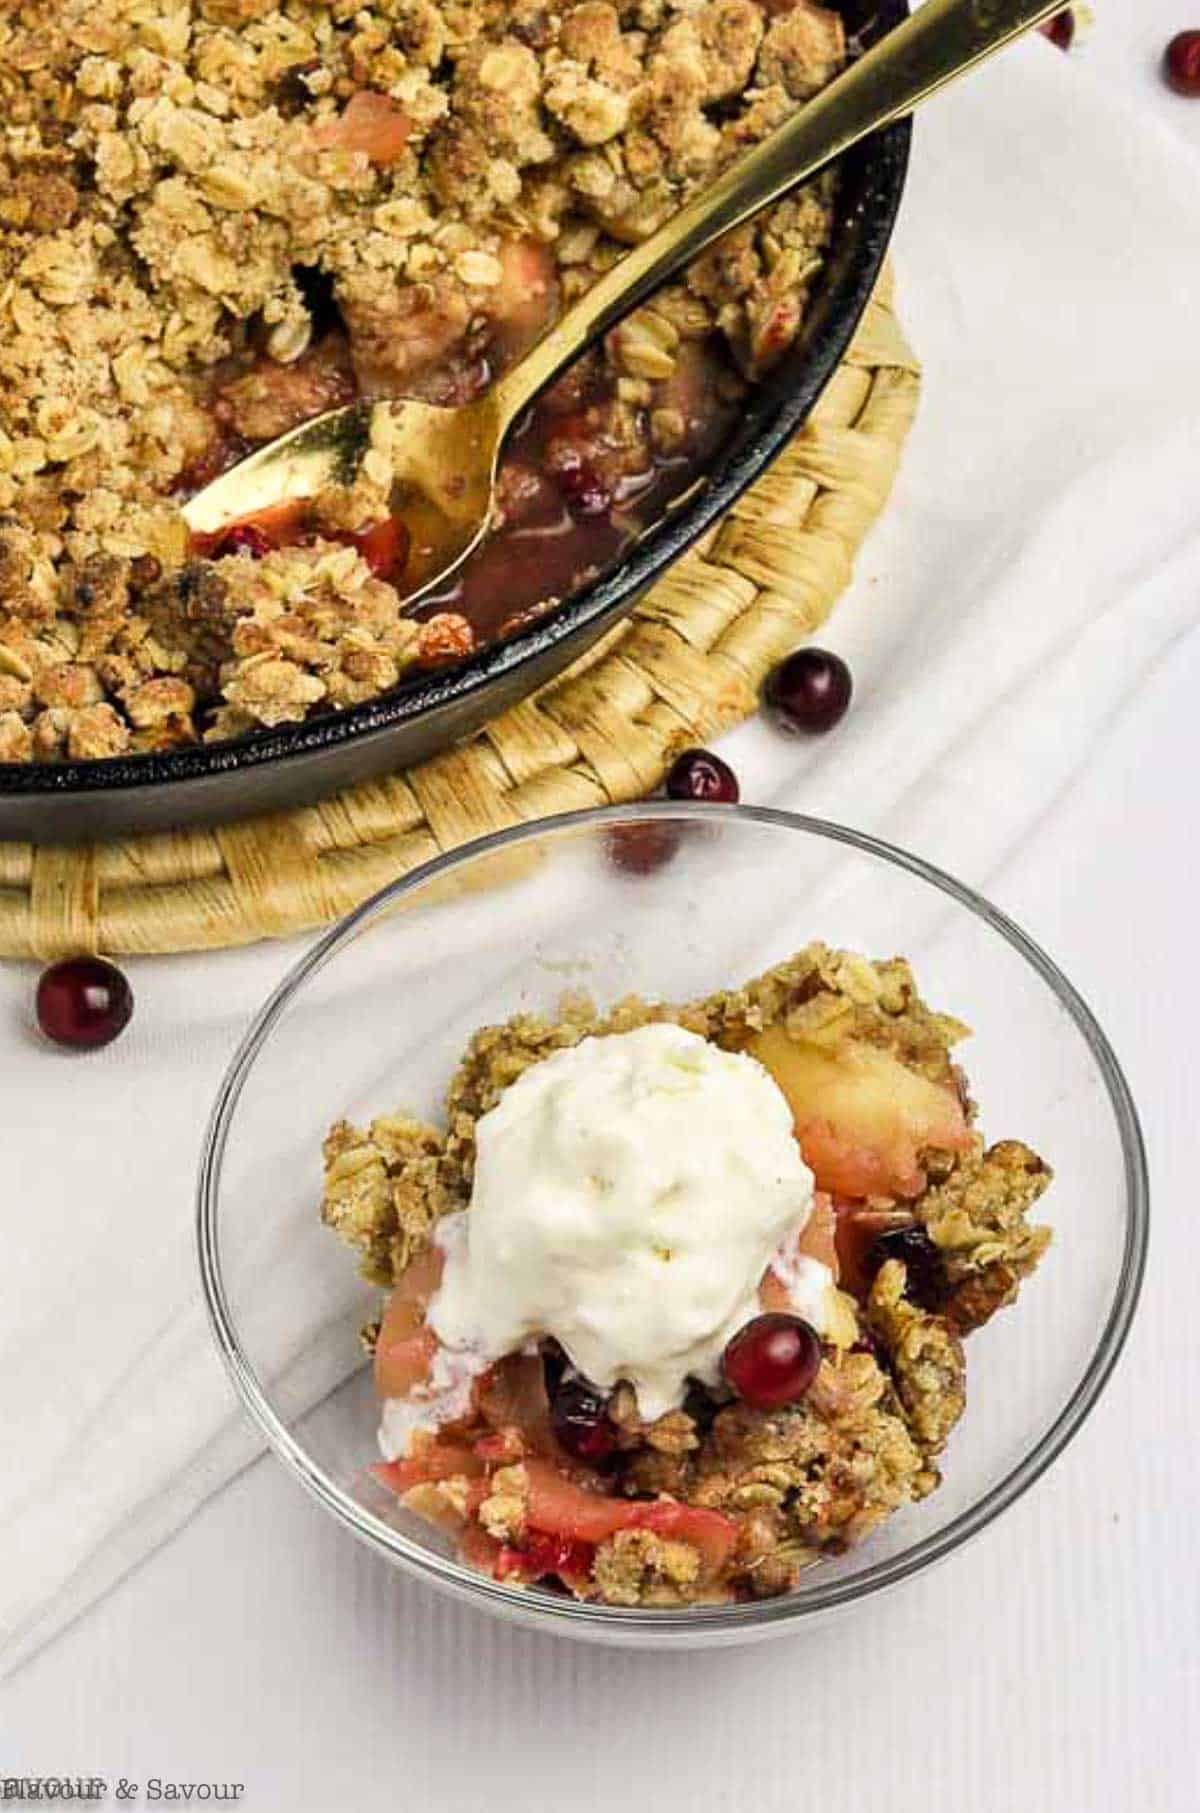 Skillet Cranberry Apple Crisp in a bowl beside a cast iron pan